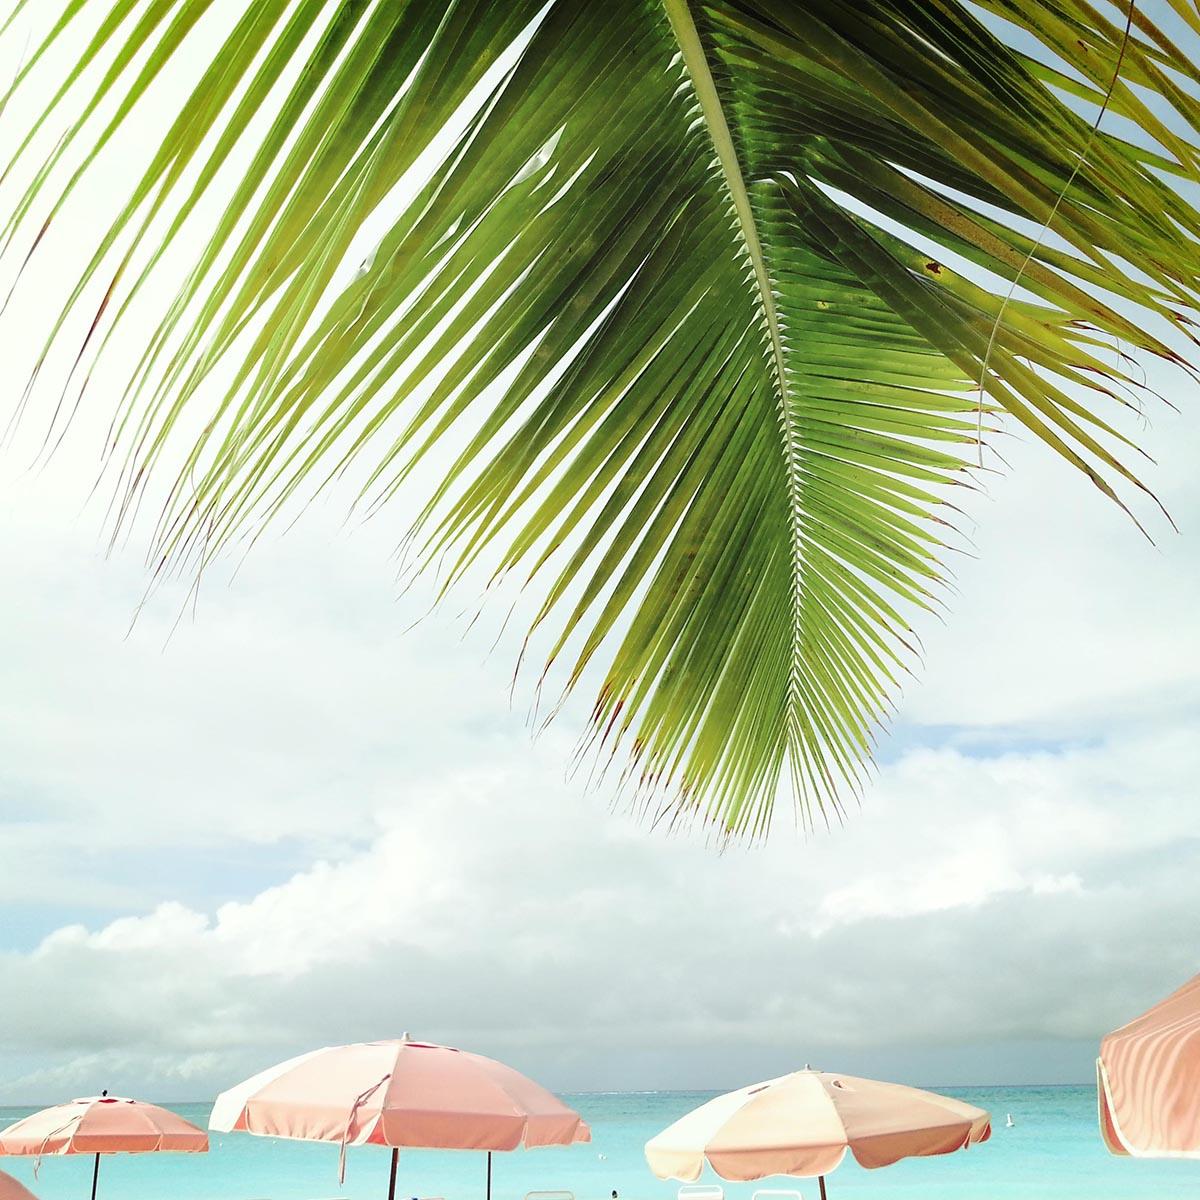 Free stock photo Palm leaf and beach umbrellas near the ocean